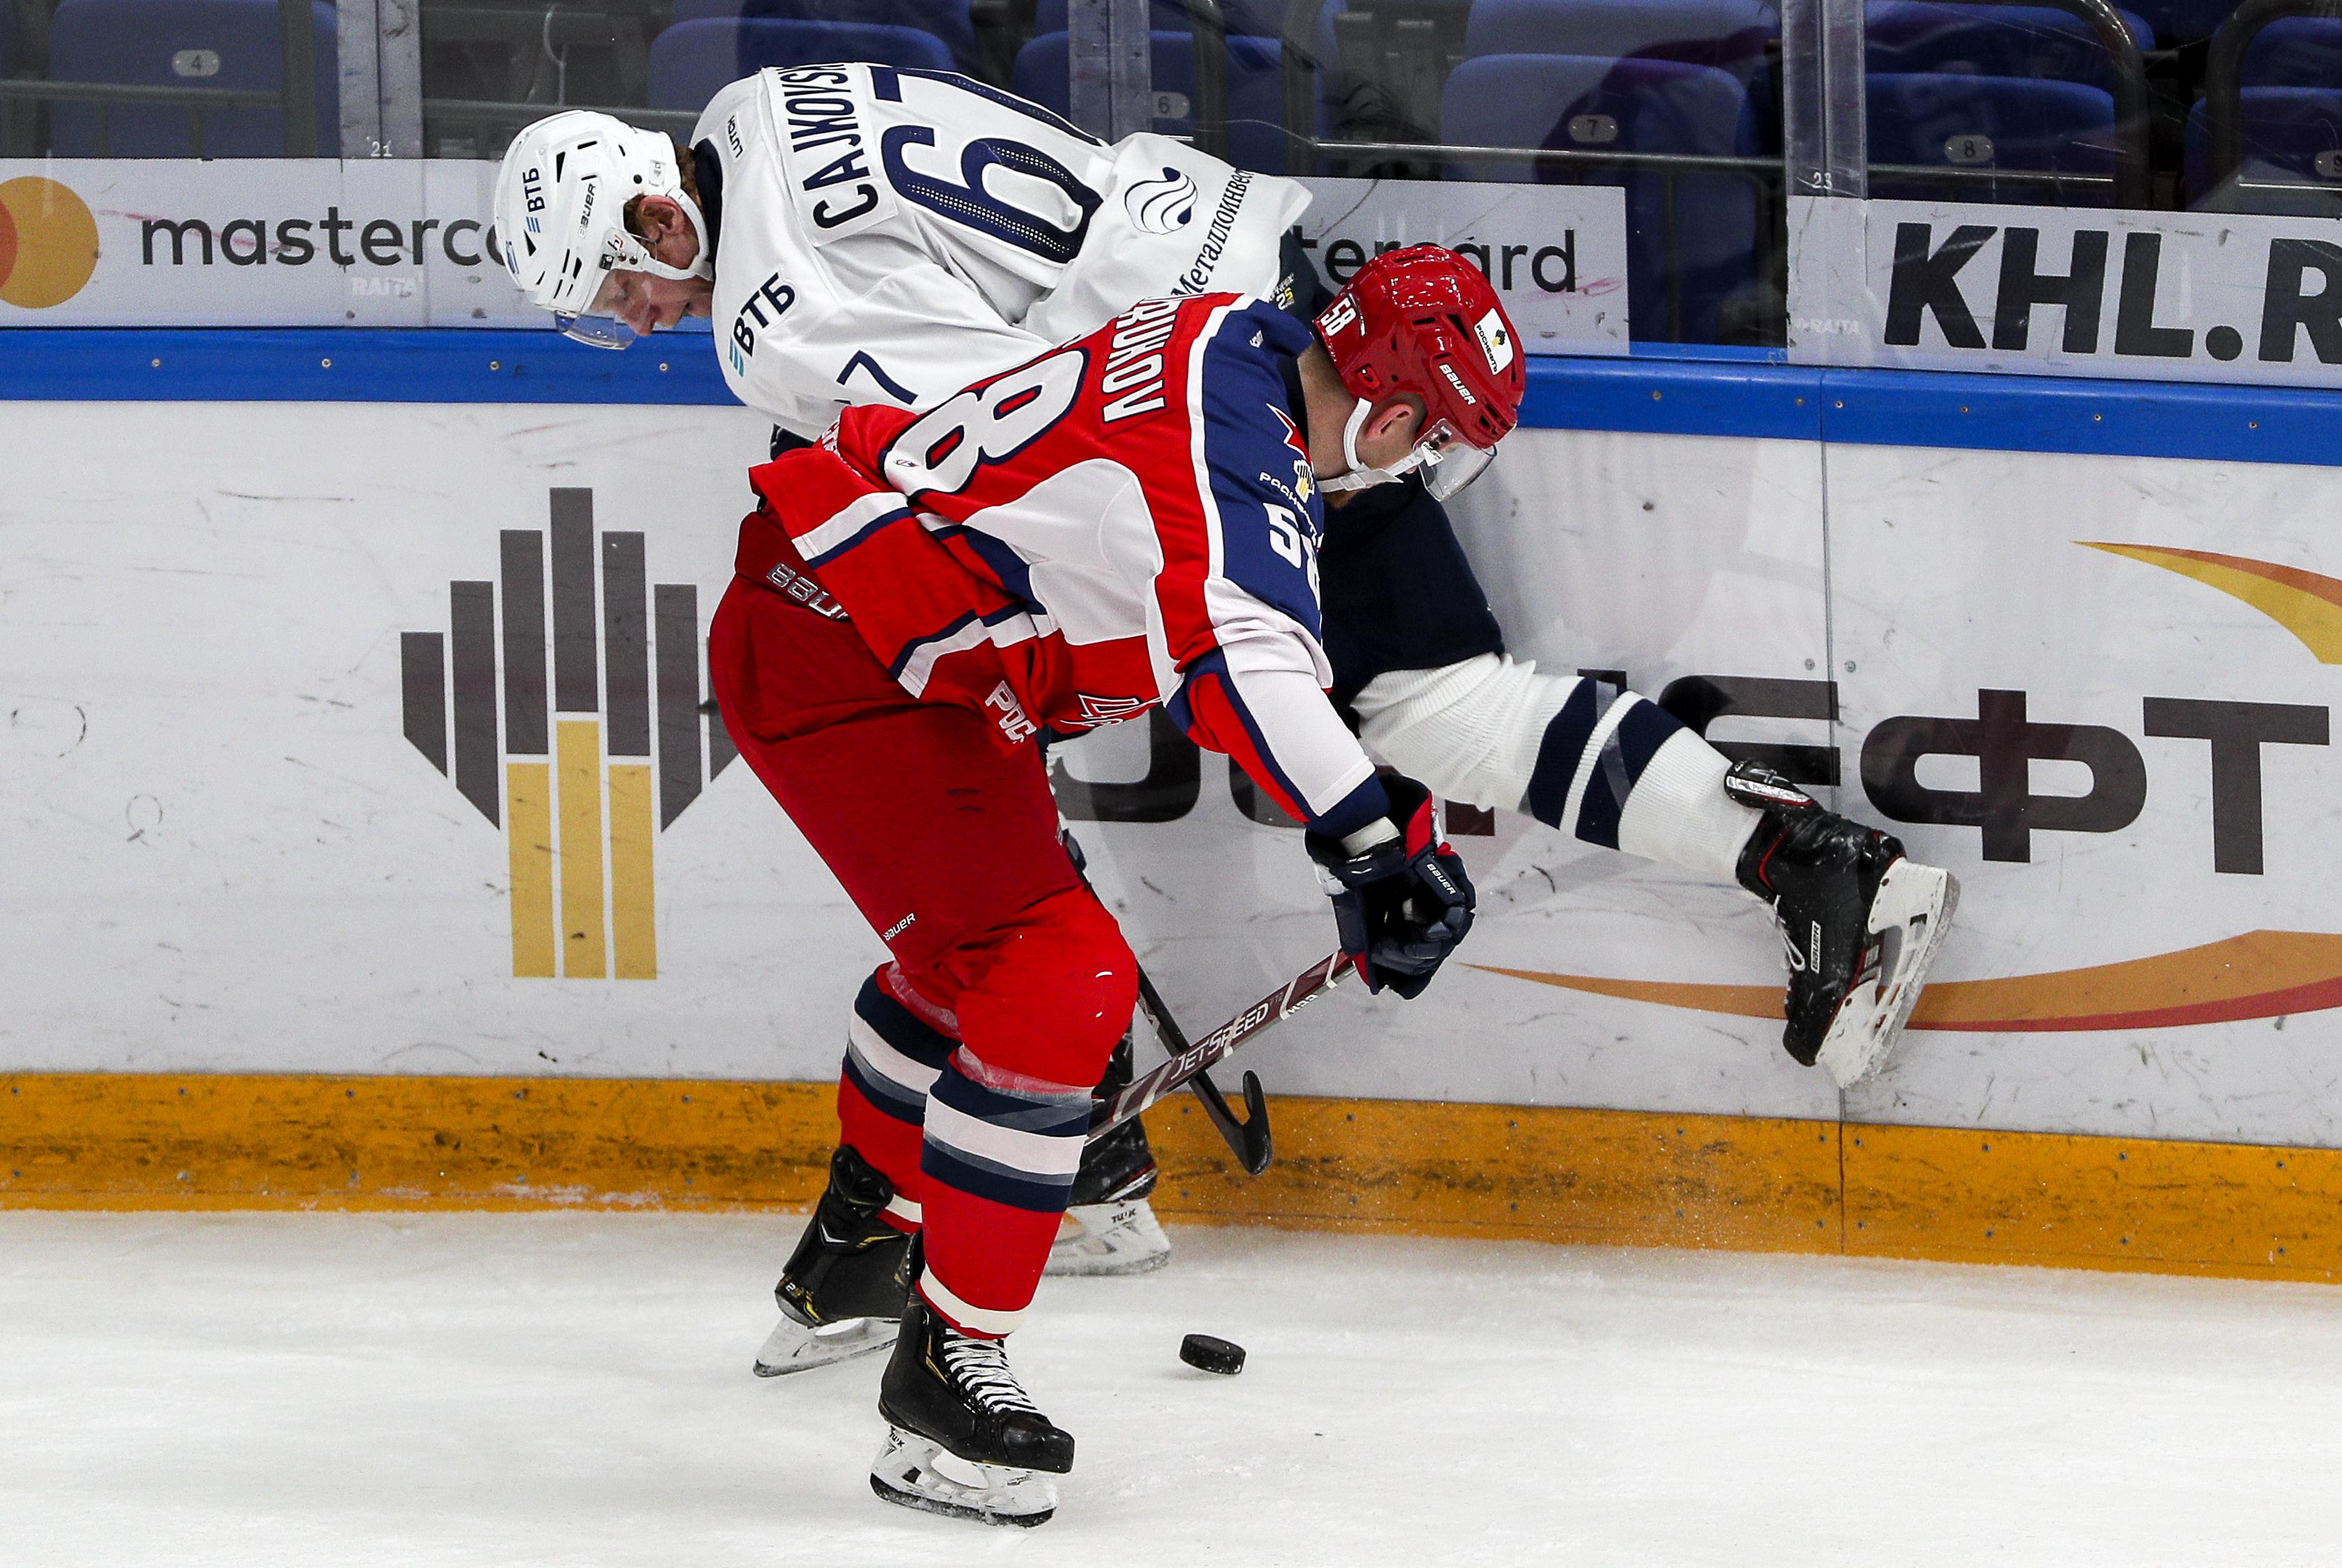 Kontinental Hockey League: CSKA Moscow 2 - 0 Dynamo Moscow